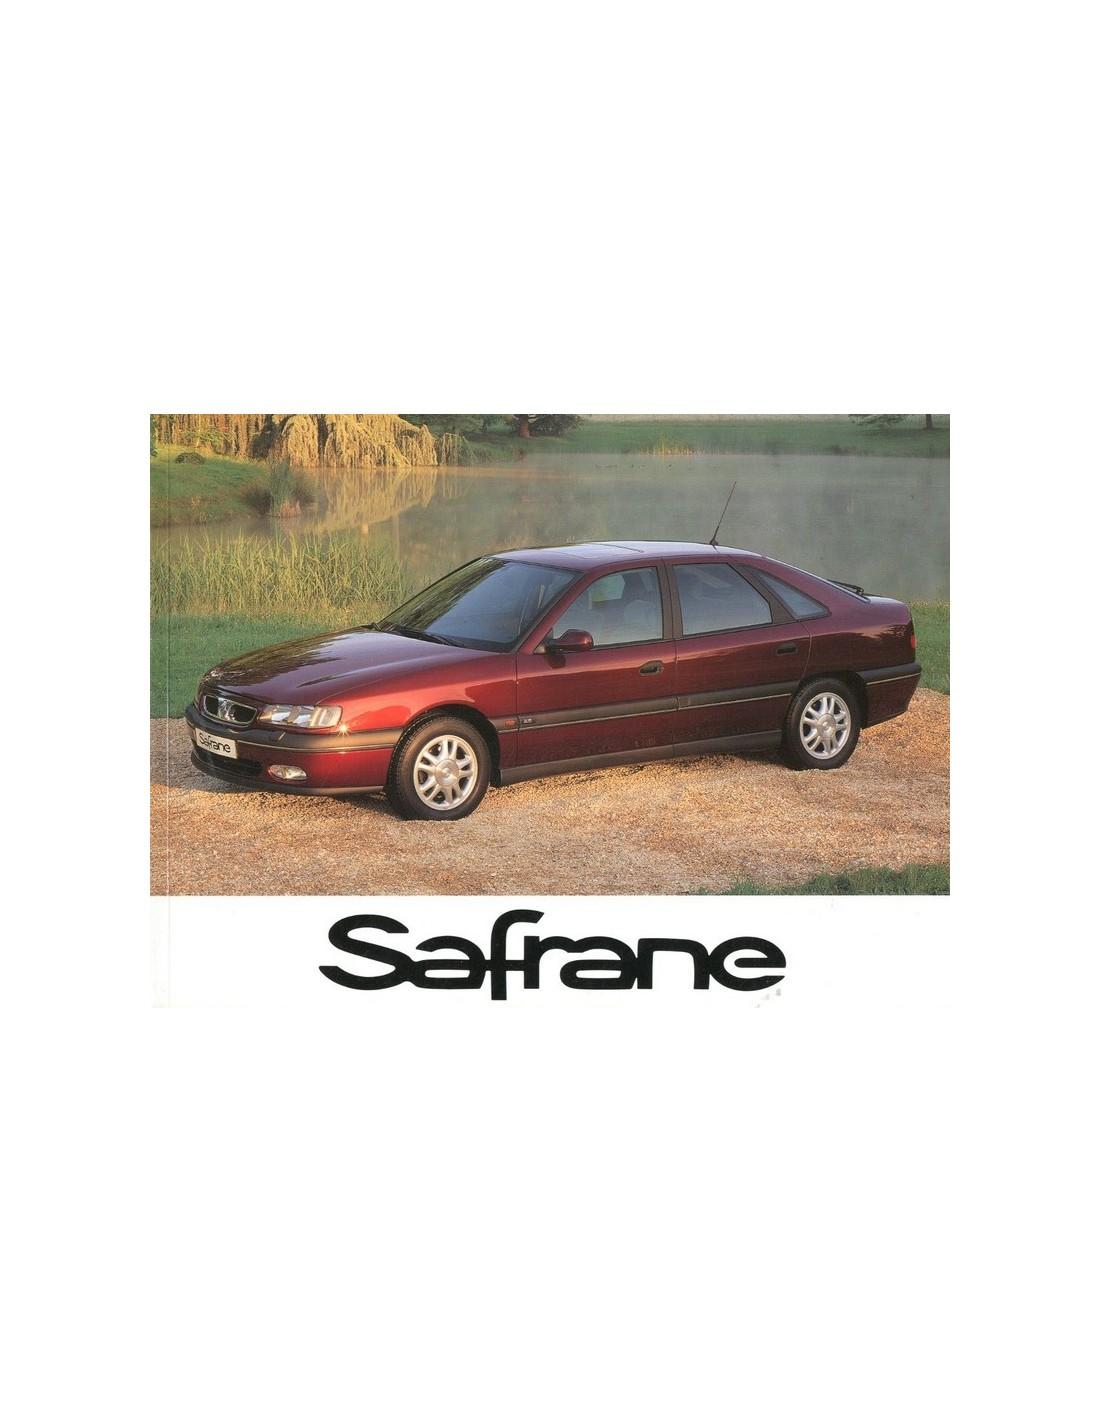 1996 Renault Safrane Owners Manual Dutch